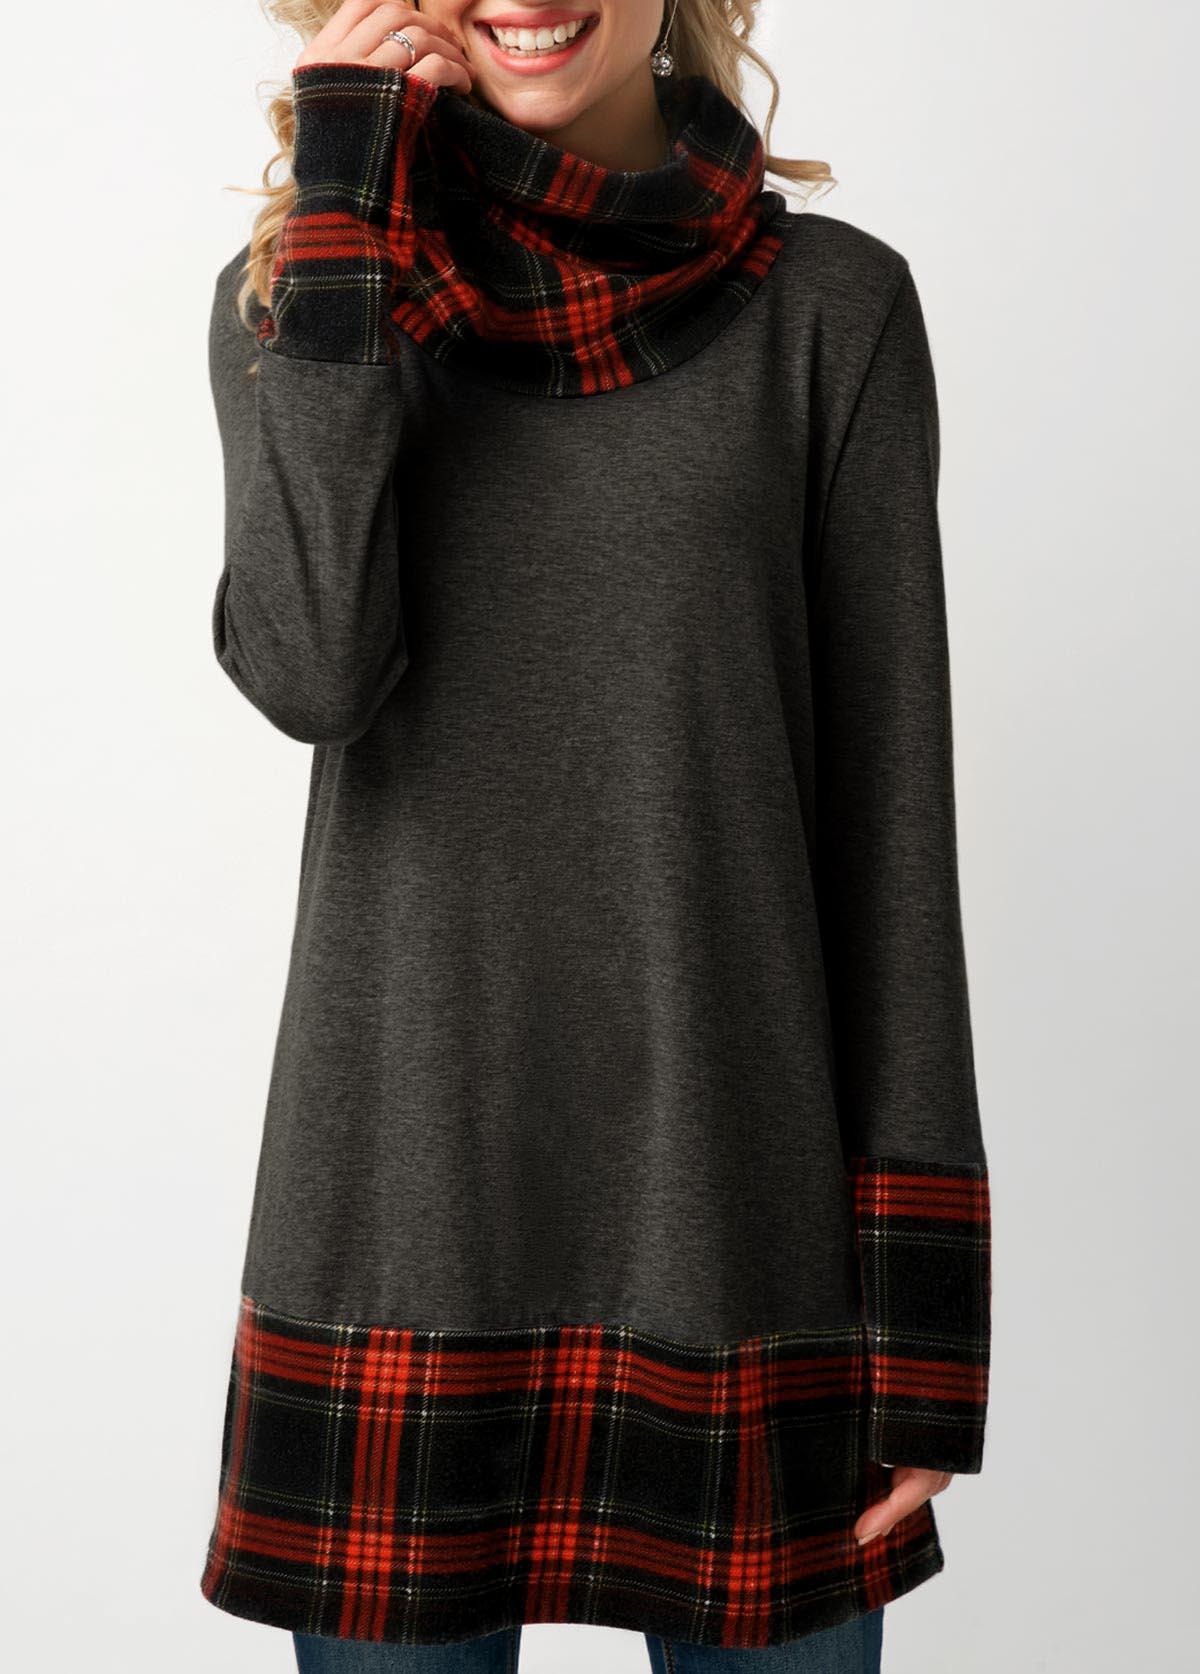 ROTITA Plaid Print Long Sleeve Cowl Neck Sweatshirt